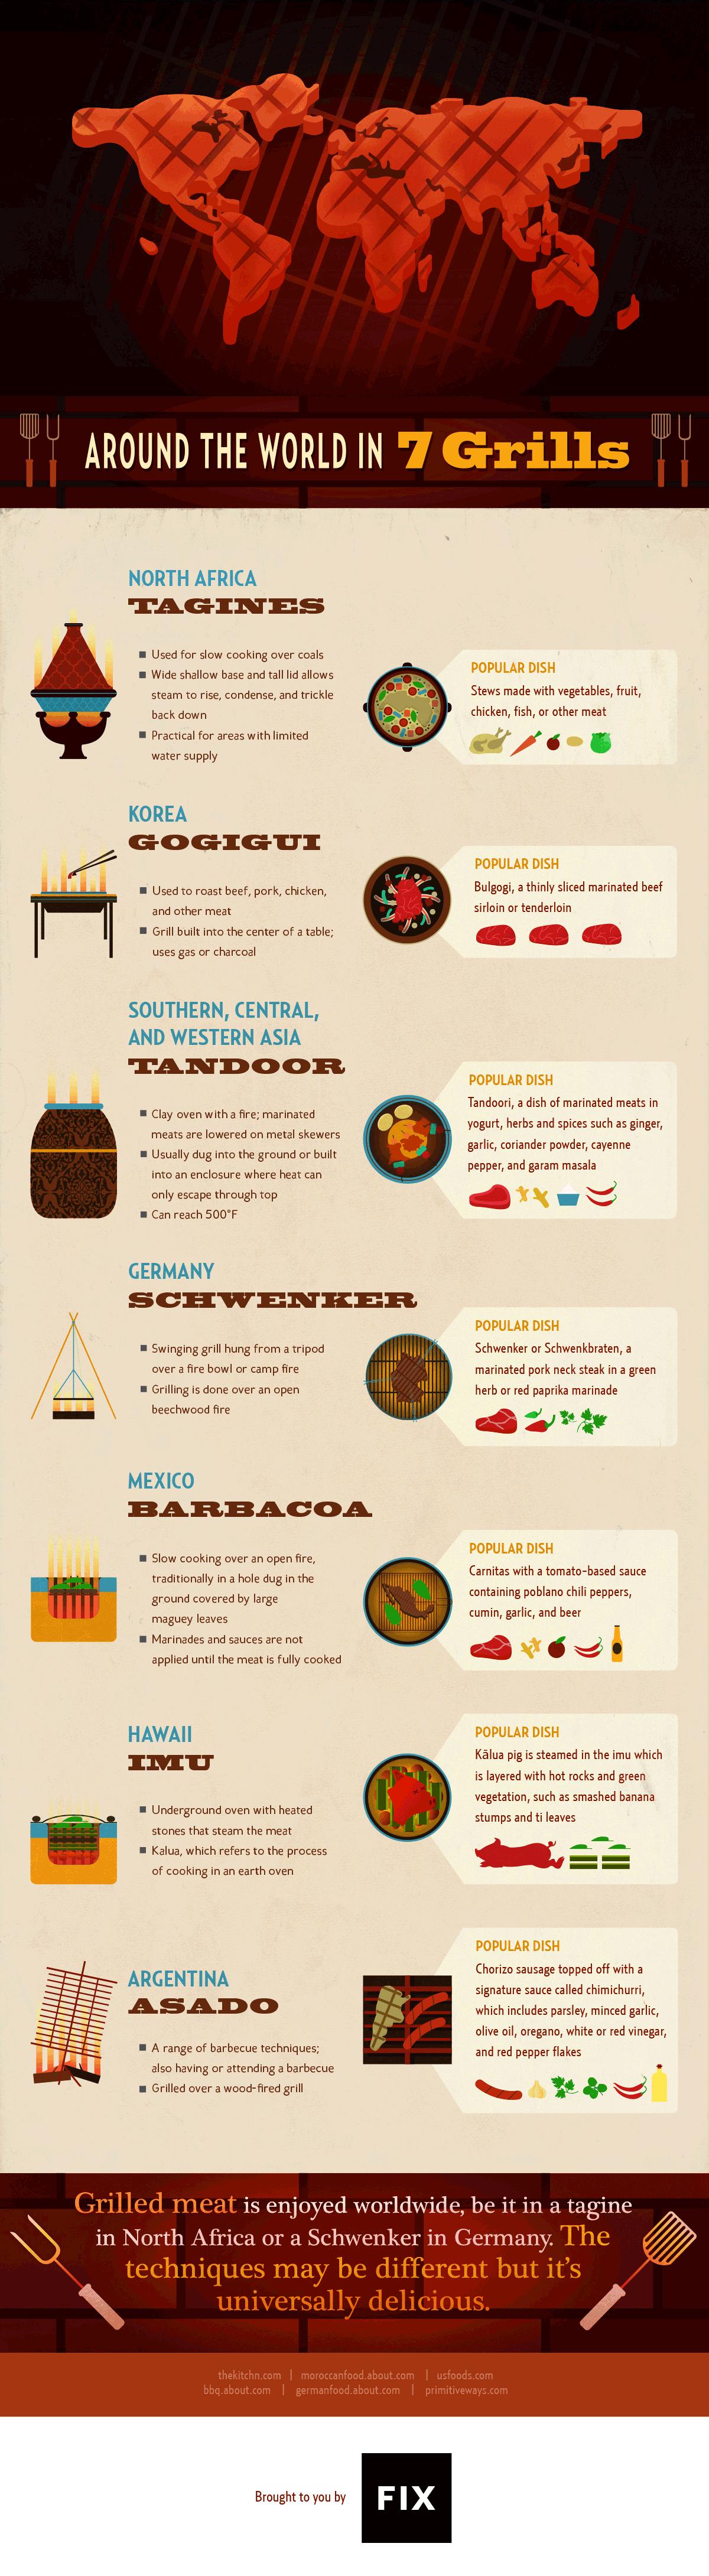 Around the World in Seven Grills